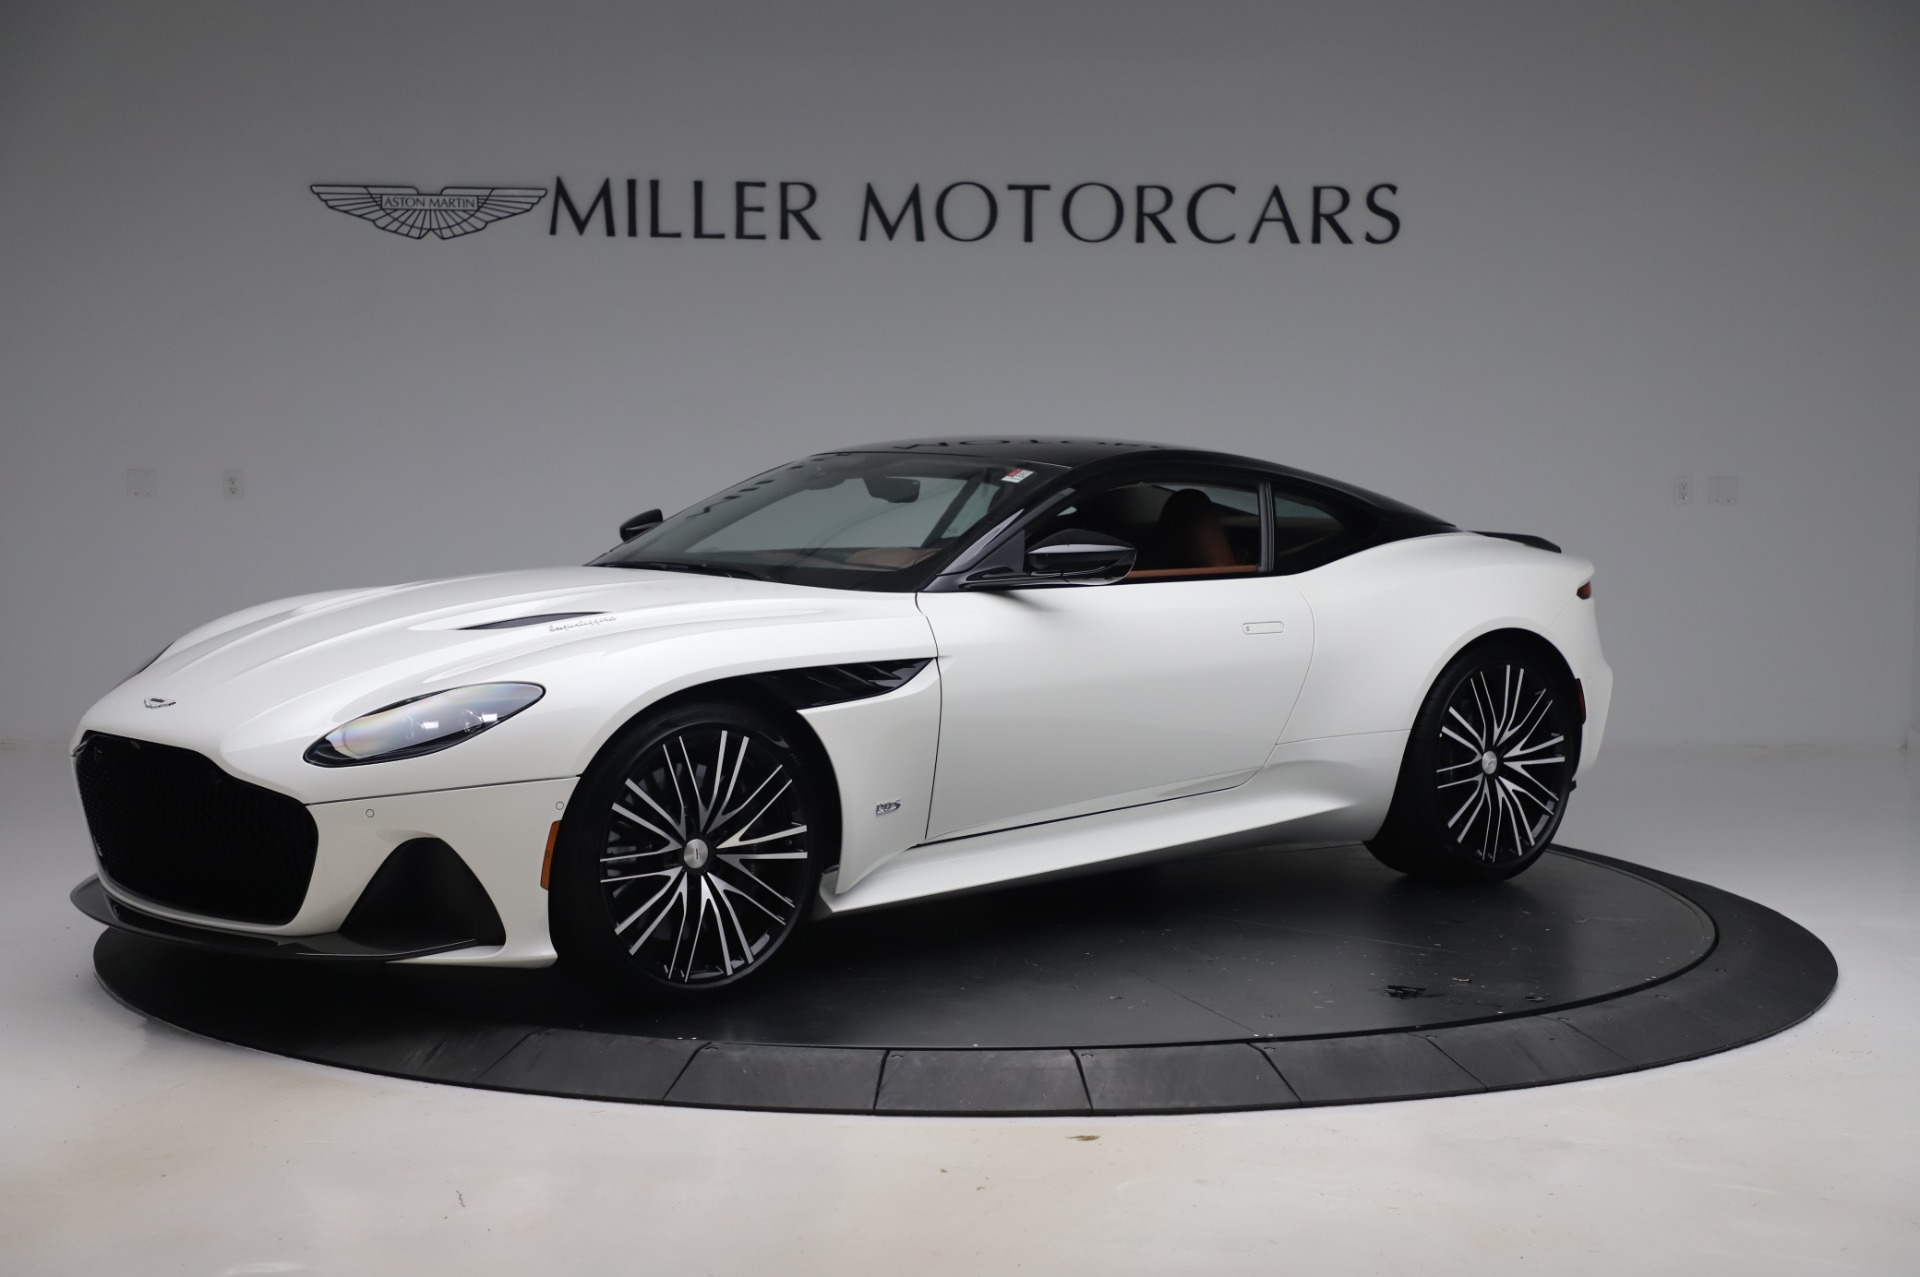 Used 2020 Aston Martin DBS Superleggera for sale $299,990 at Bugatti of Greenwich in Greenwich CT 06830 1